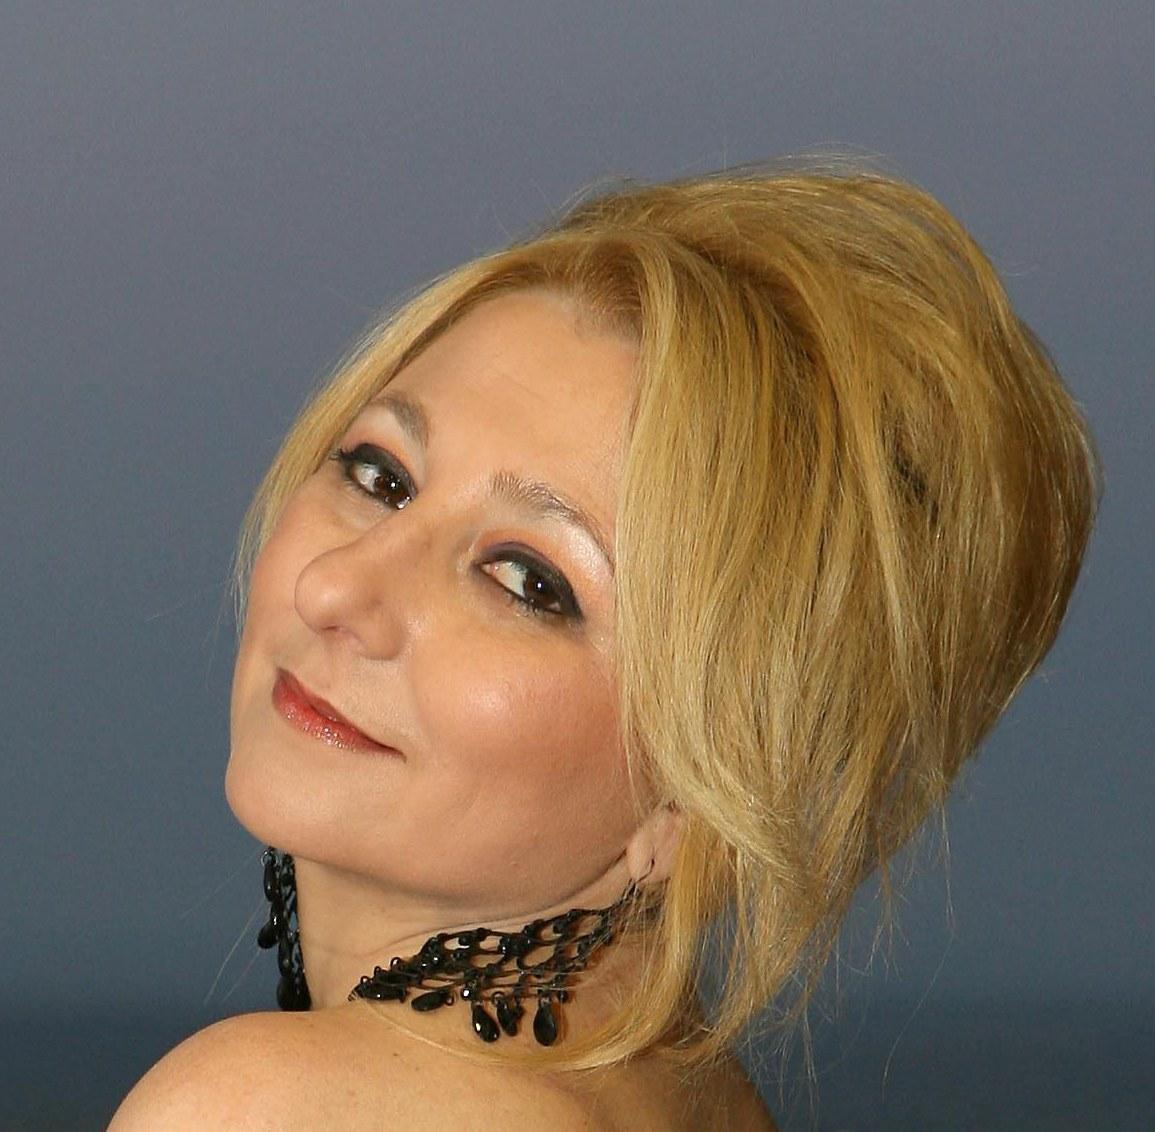 Pilar Boyero actúa esta noche en Torrejoncillo